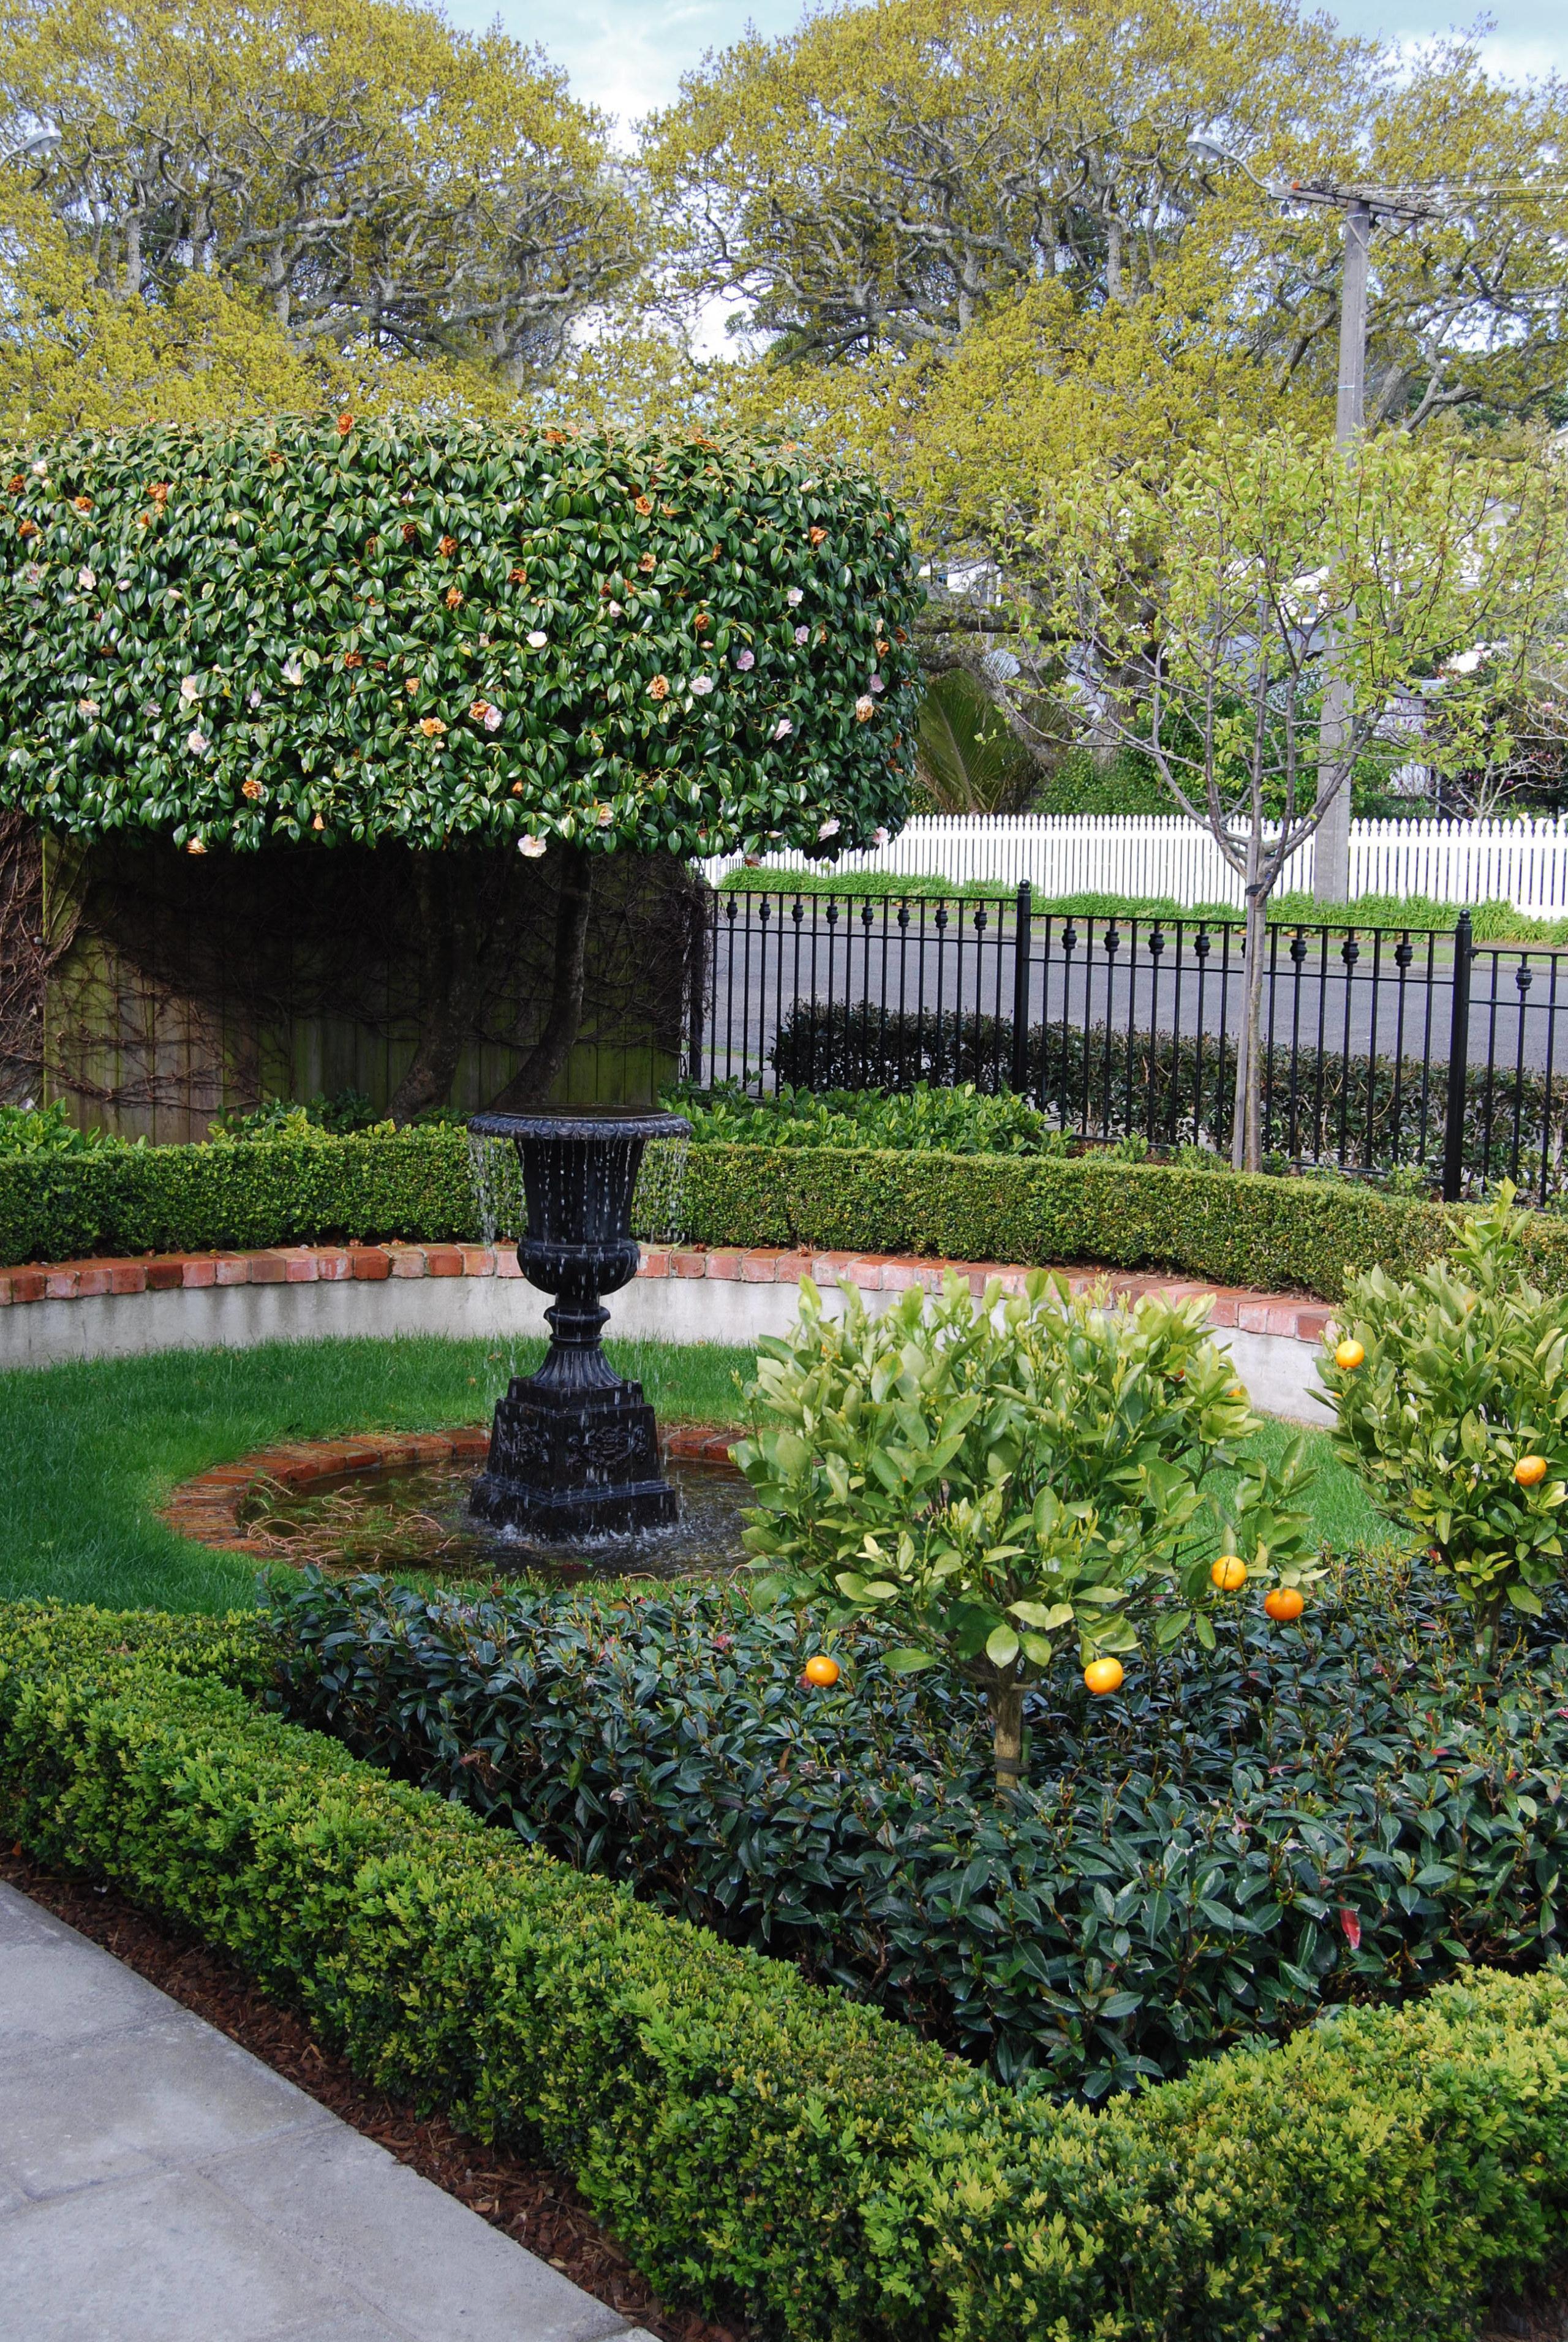 View of formal garden designed by Michael Mansvelt botanical garden, evergreen, flower, garden, grass, hedge, landscape, landscaping, leaf, outdoor structure, plant, shrub, tree, walkway, yard, green